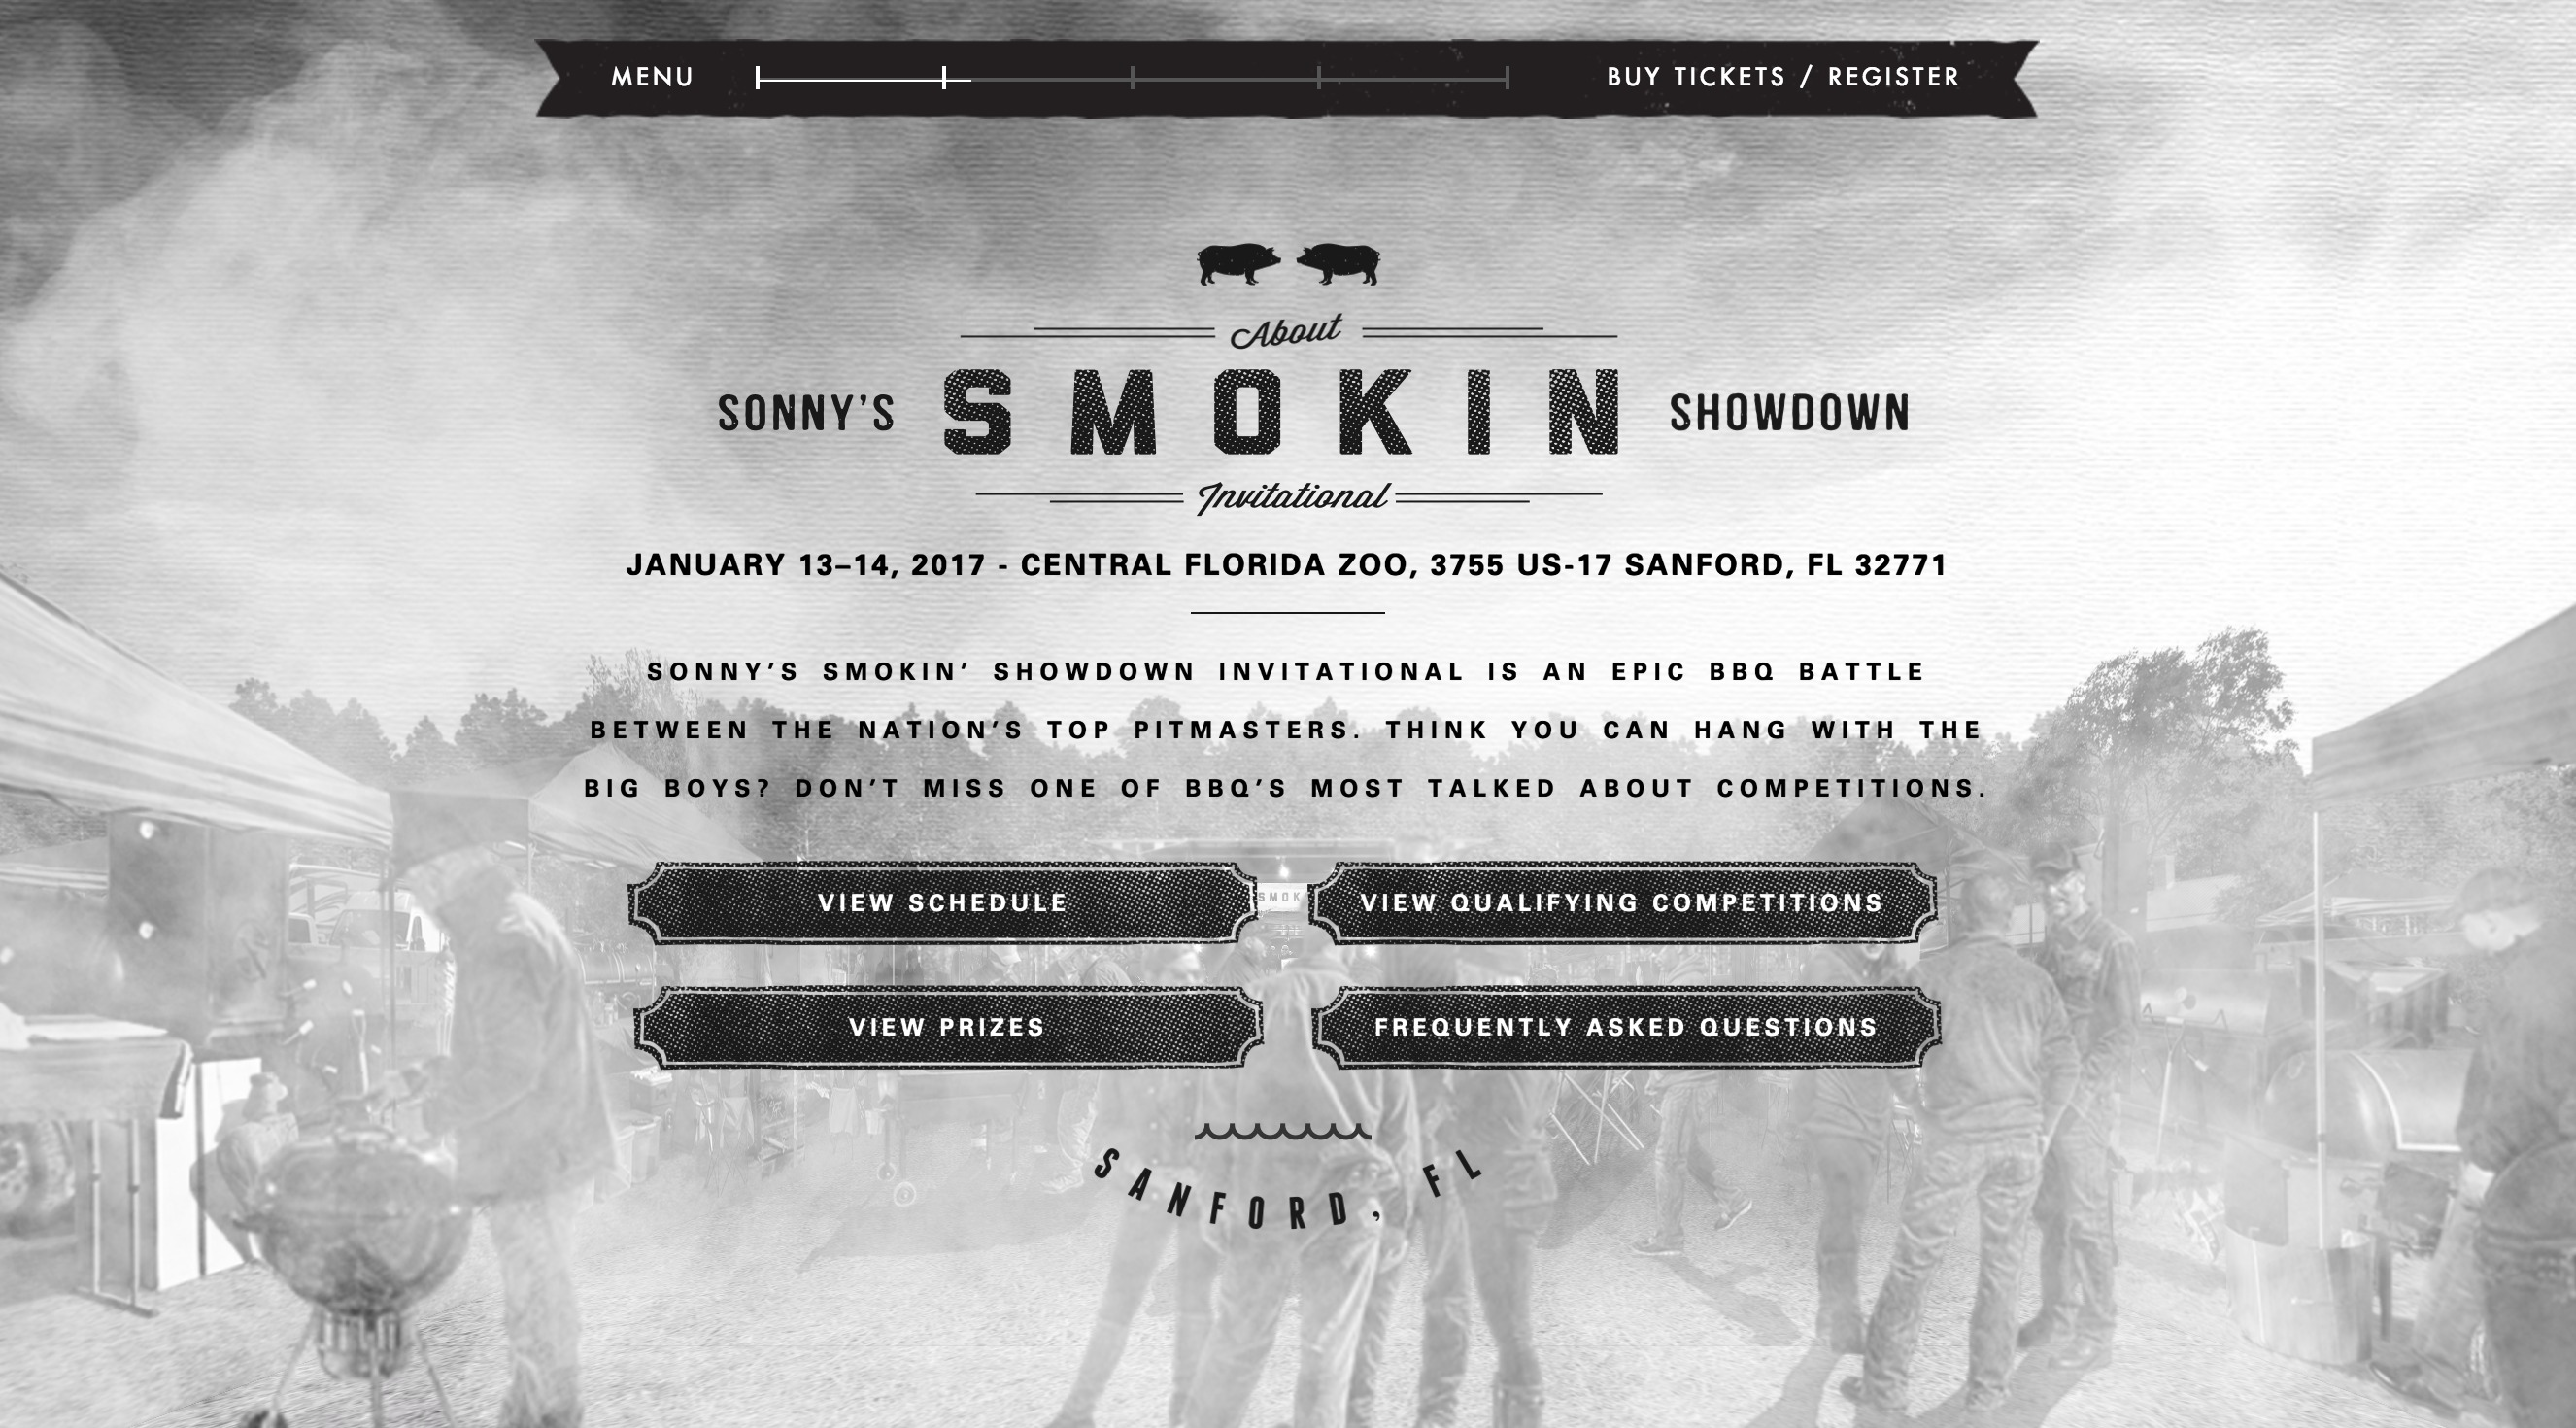 sonny-s-smokin-showdown-florida-bbq-competencia-sonny-s-bbq